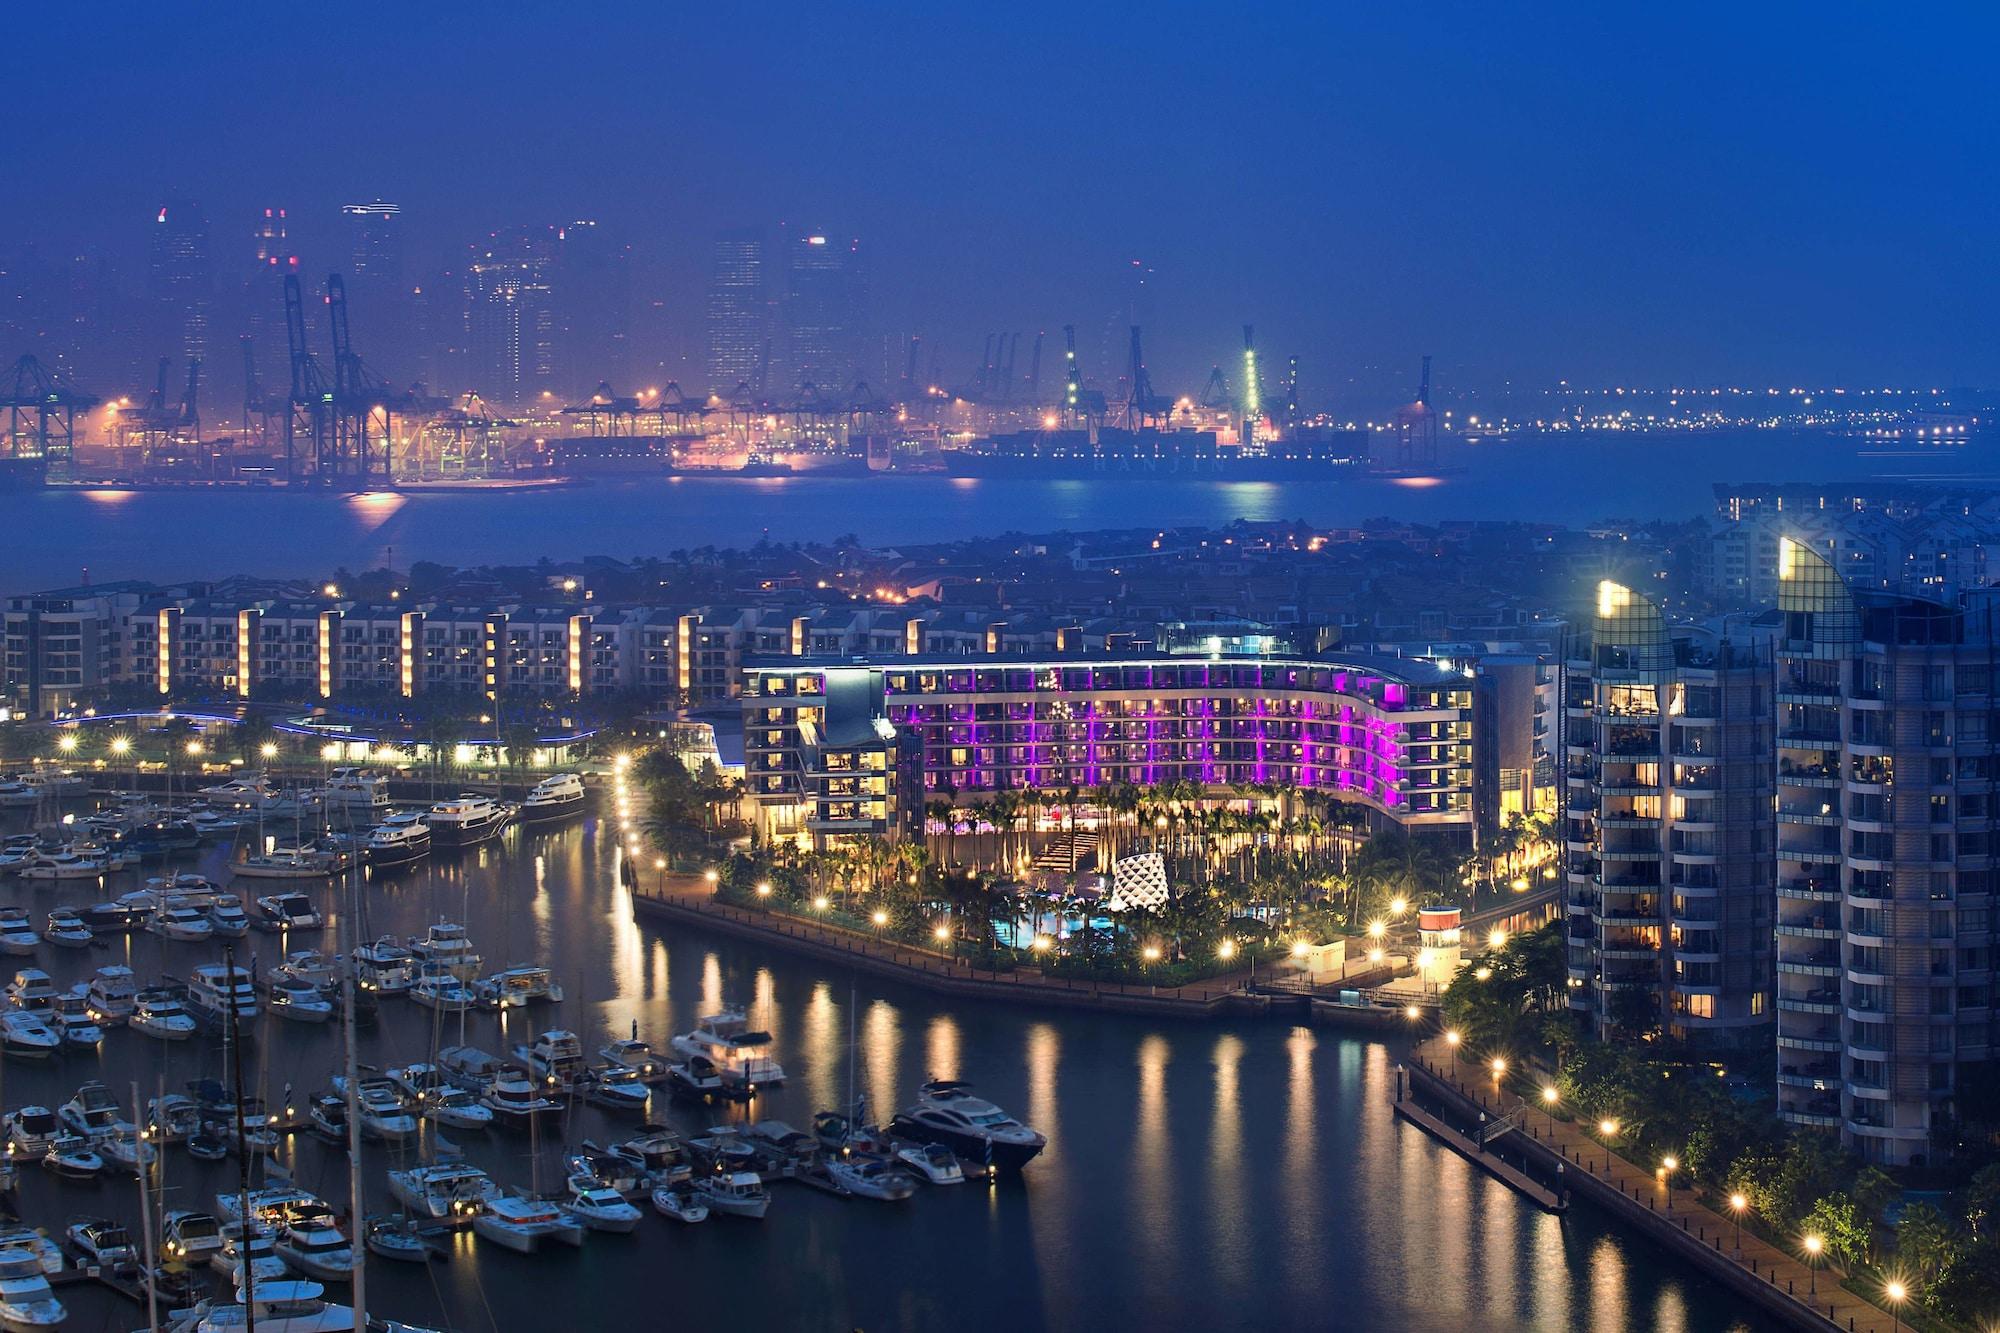 W Singapore - Sentosa Cove, Pulau Sentosa